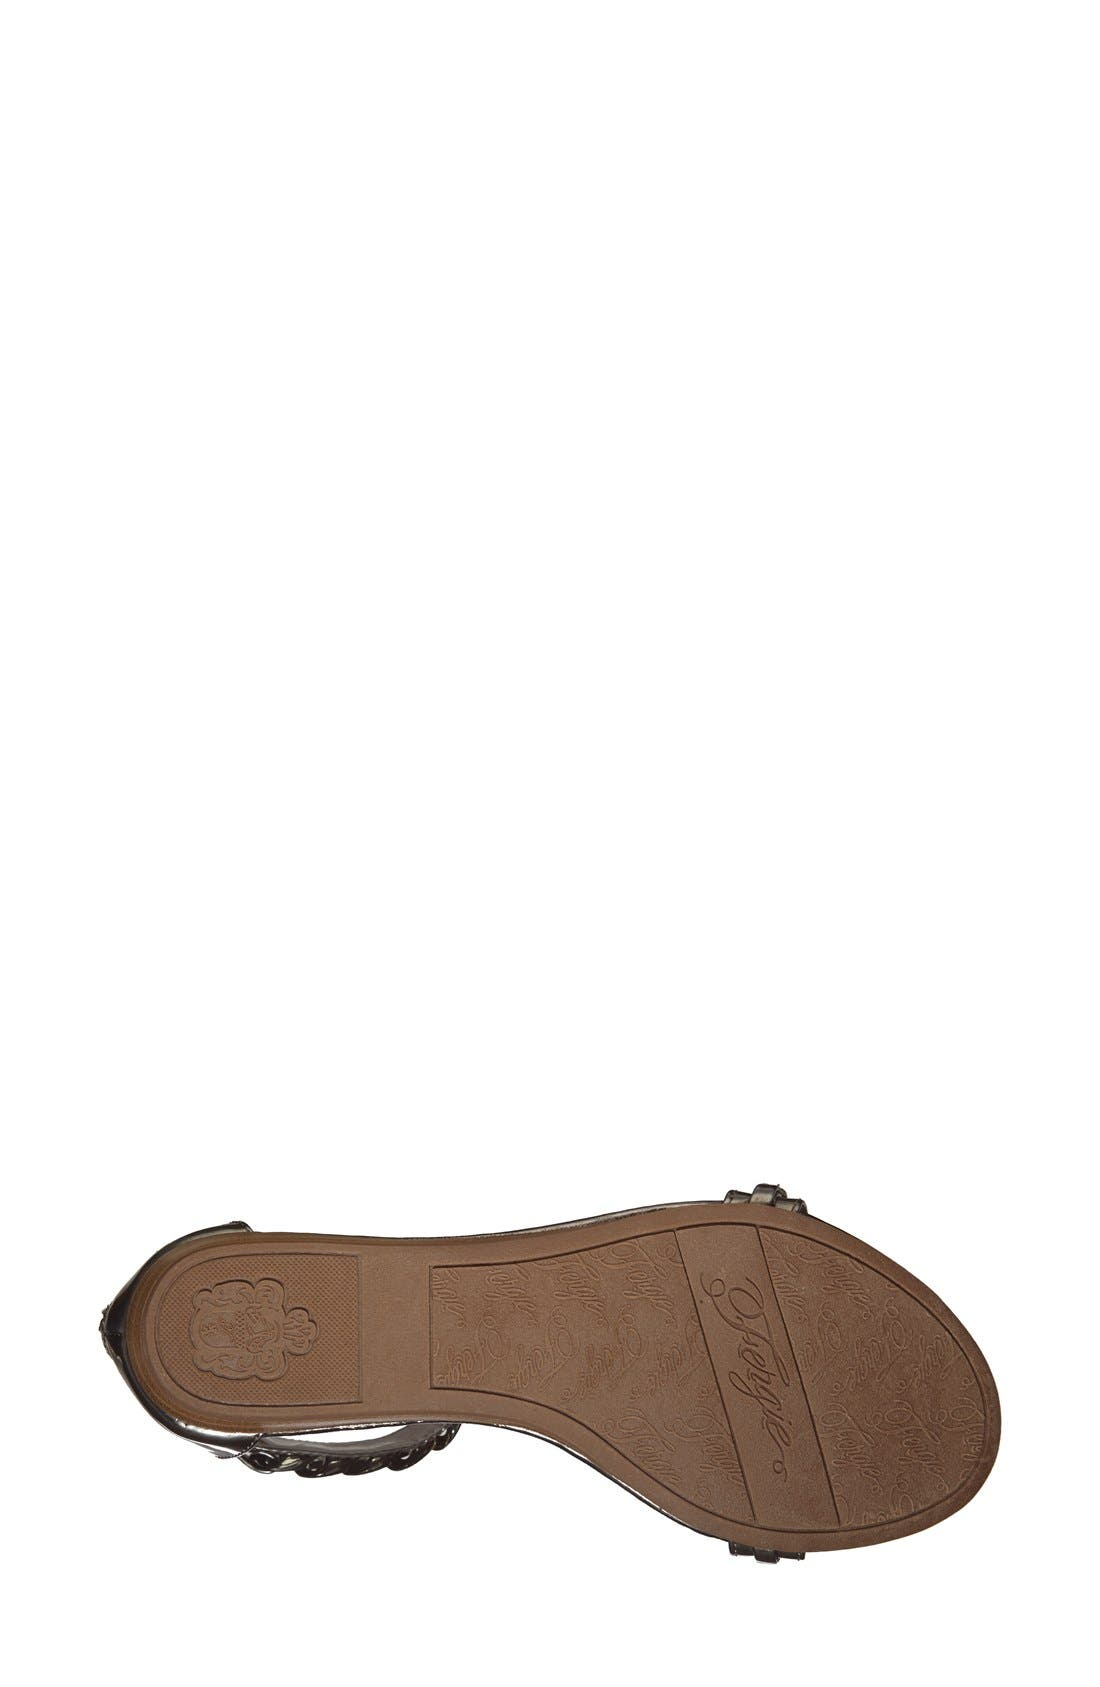 Alternate Image 4  - Fergie 'Grind' Sandal (Women)